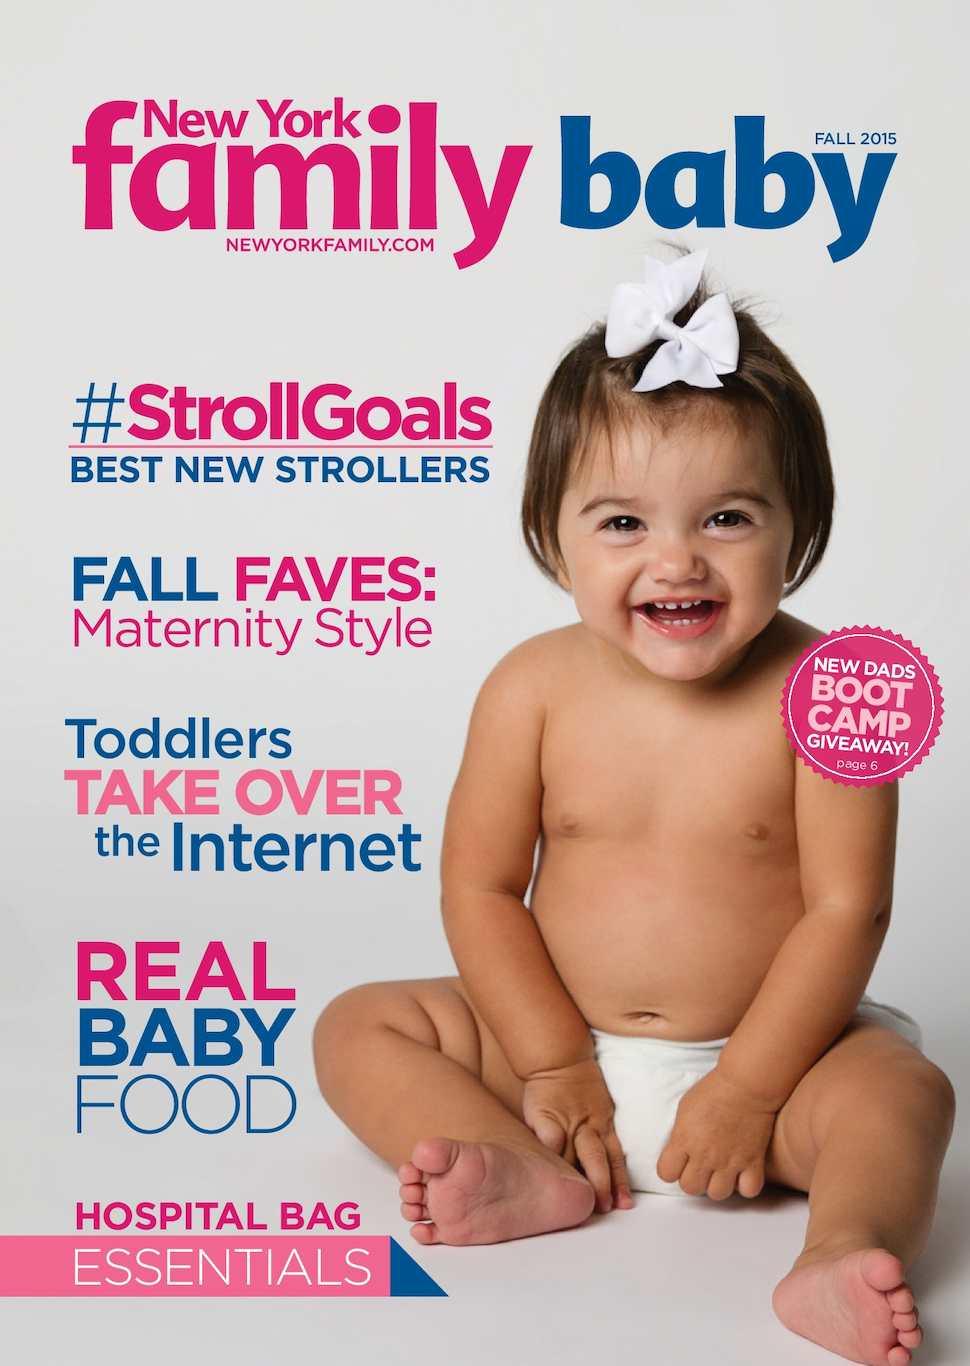 f2a8679fbf24d3 Calaméo - New York Family Baby Fall 2015